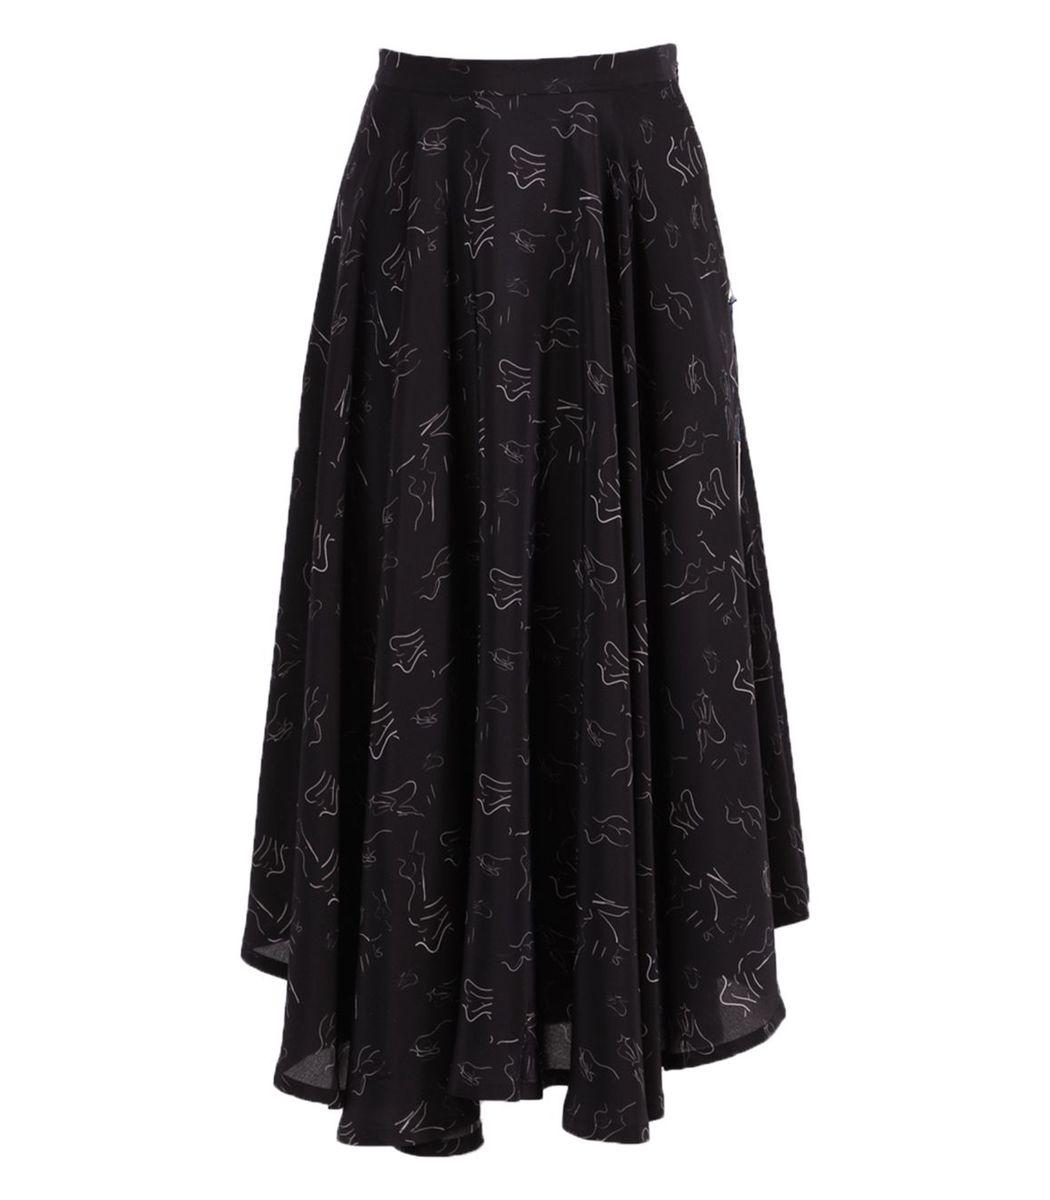 Lhd Denims French Riviera Skirt